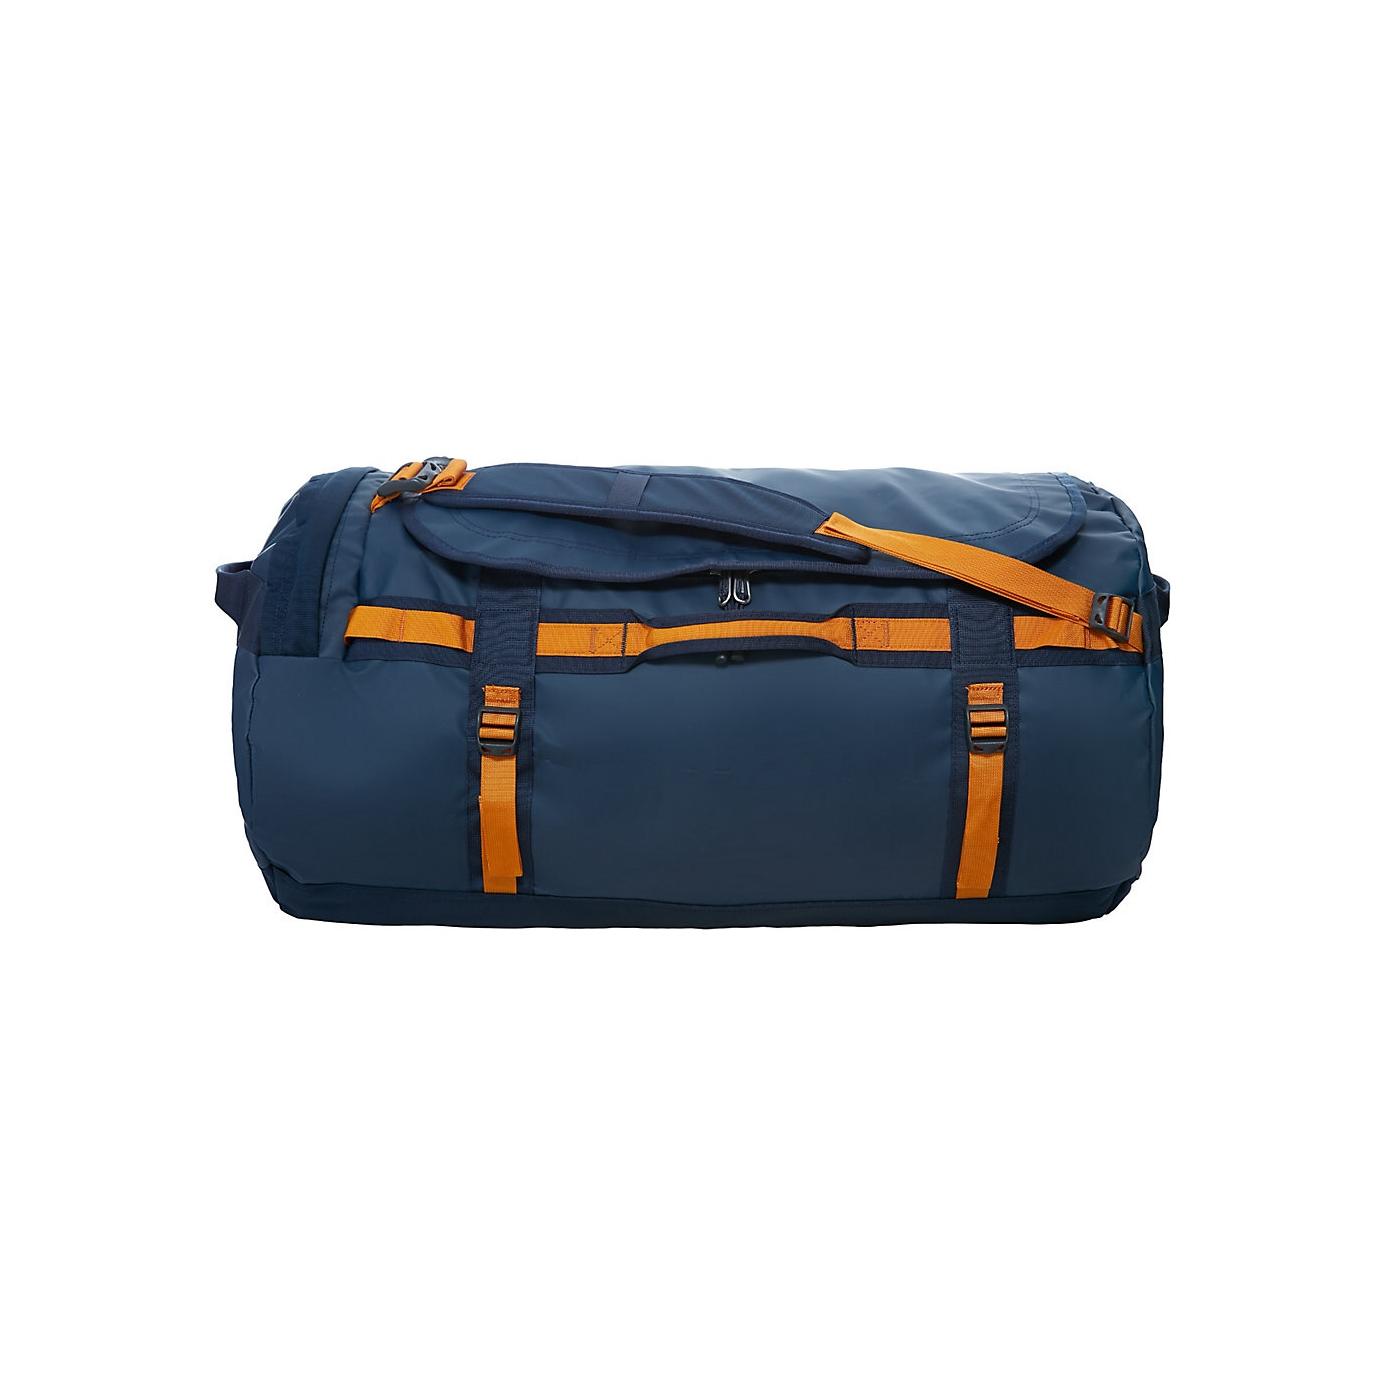 the north face base camp duffel reisetasche gr l 95 liter tasche cww1lmt blau ebay. Black Bedroom Furniture Sets. Home Design Ideas